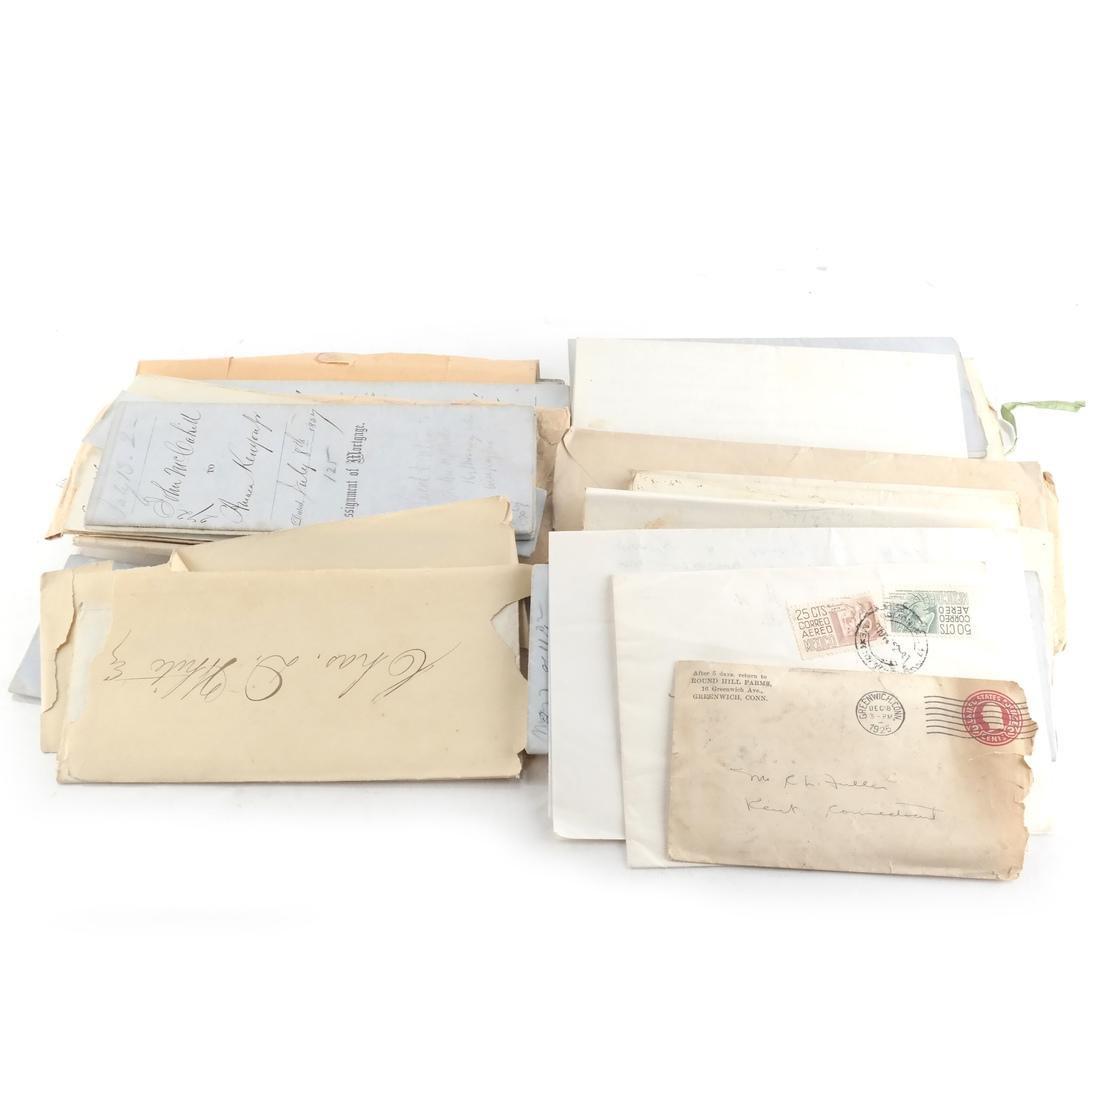 Ephemera: Correspondence of Charles D. White